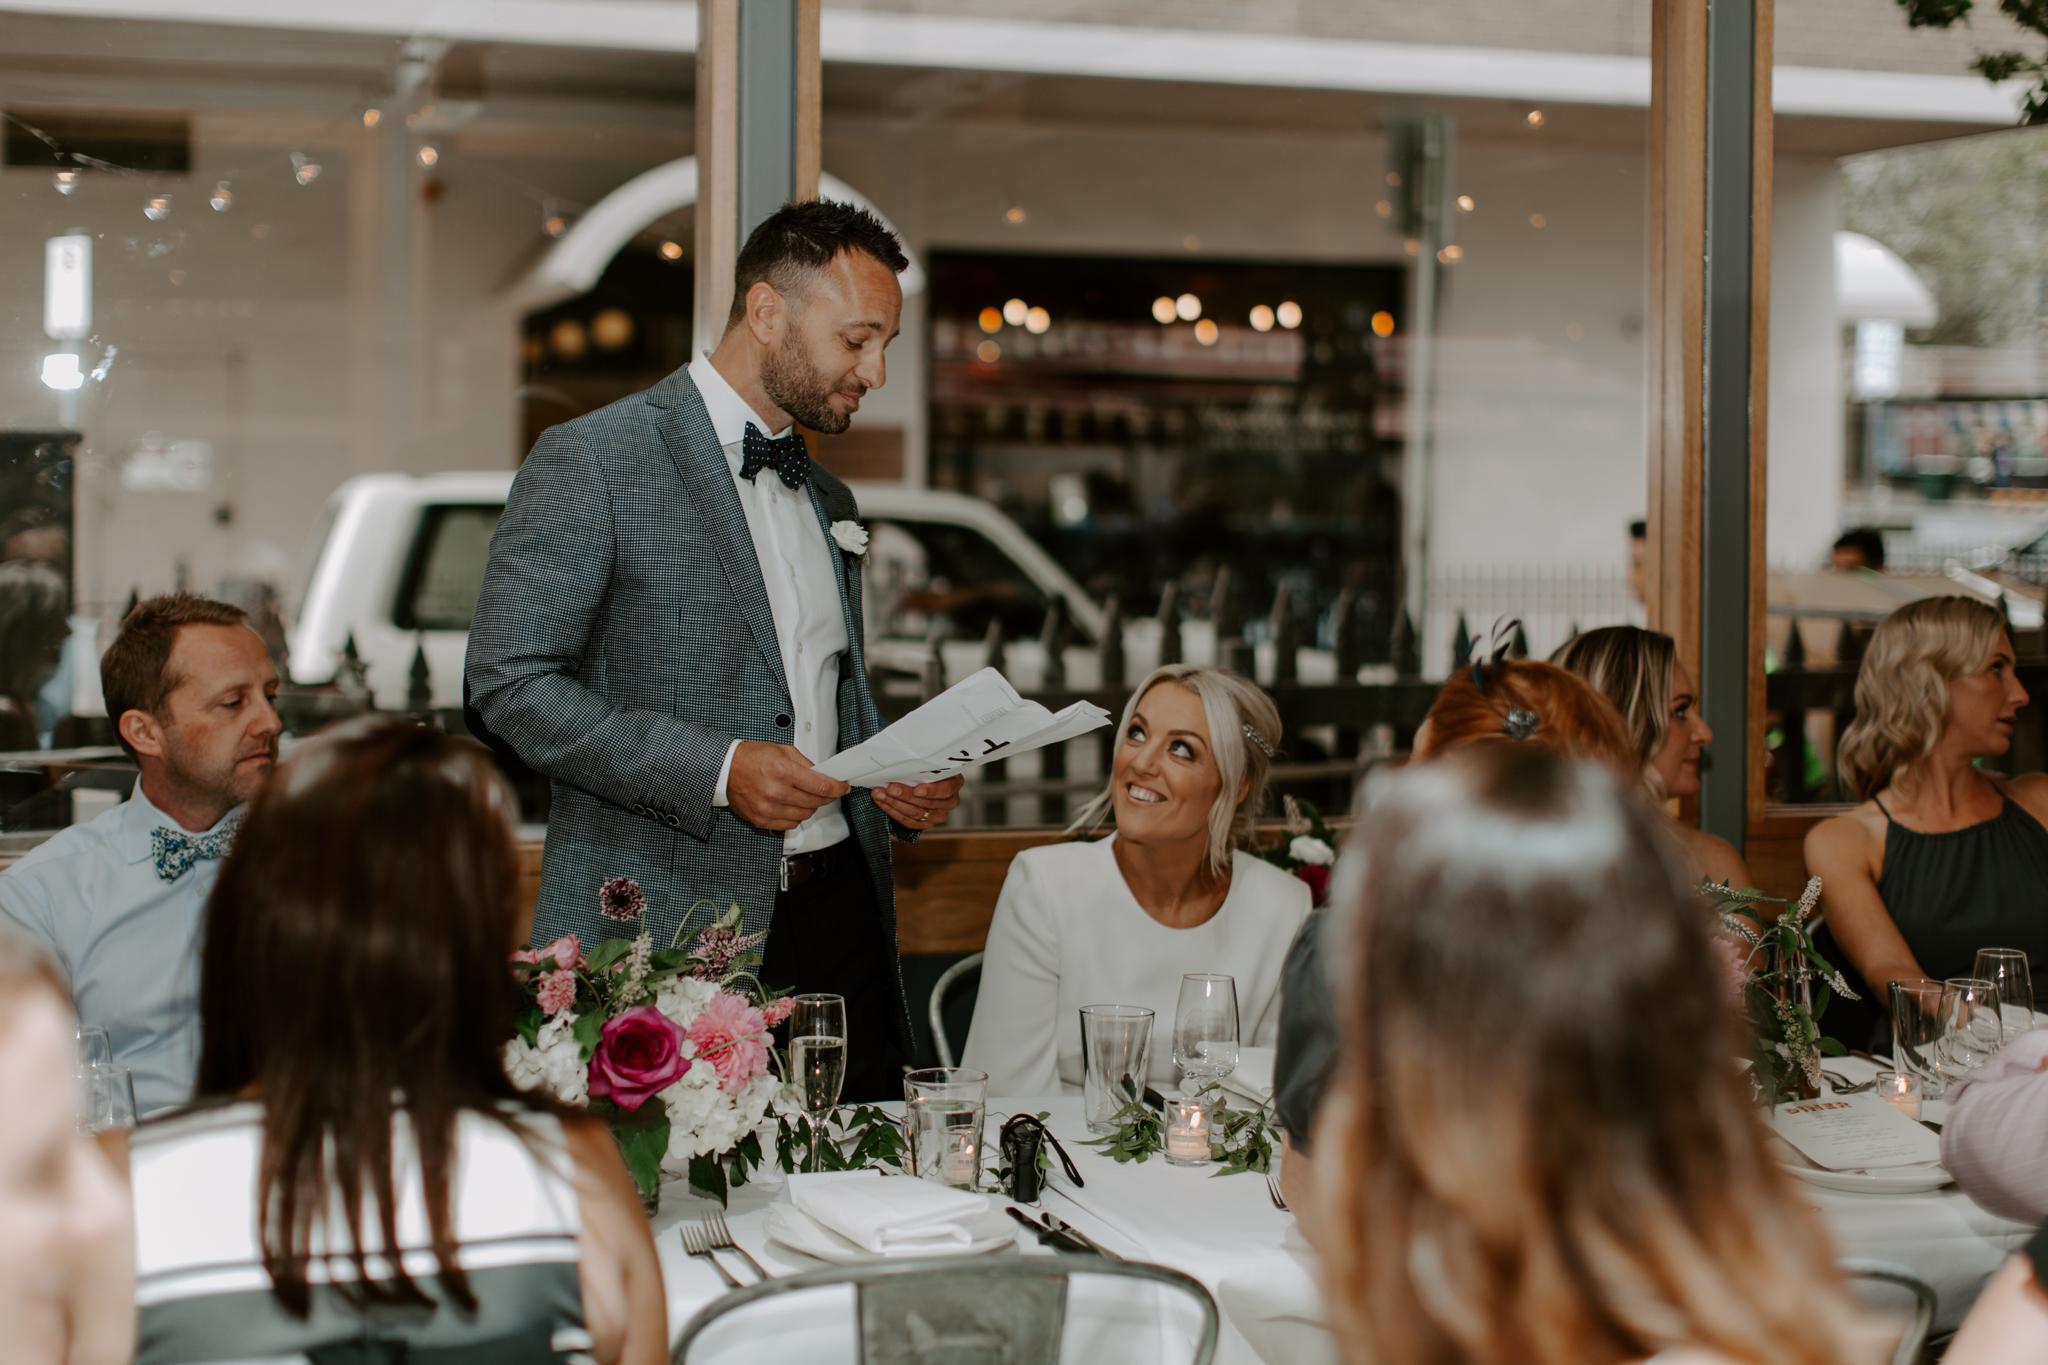 Trunk-restaurant-wedding-EmotionsandMath-067.jpg